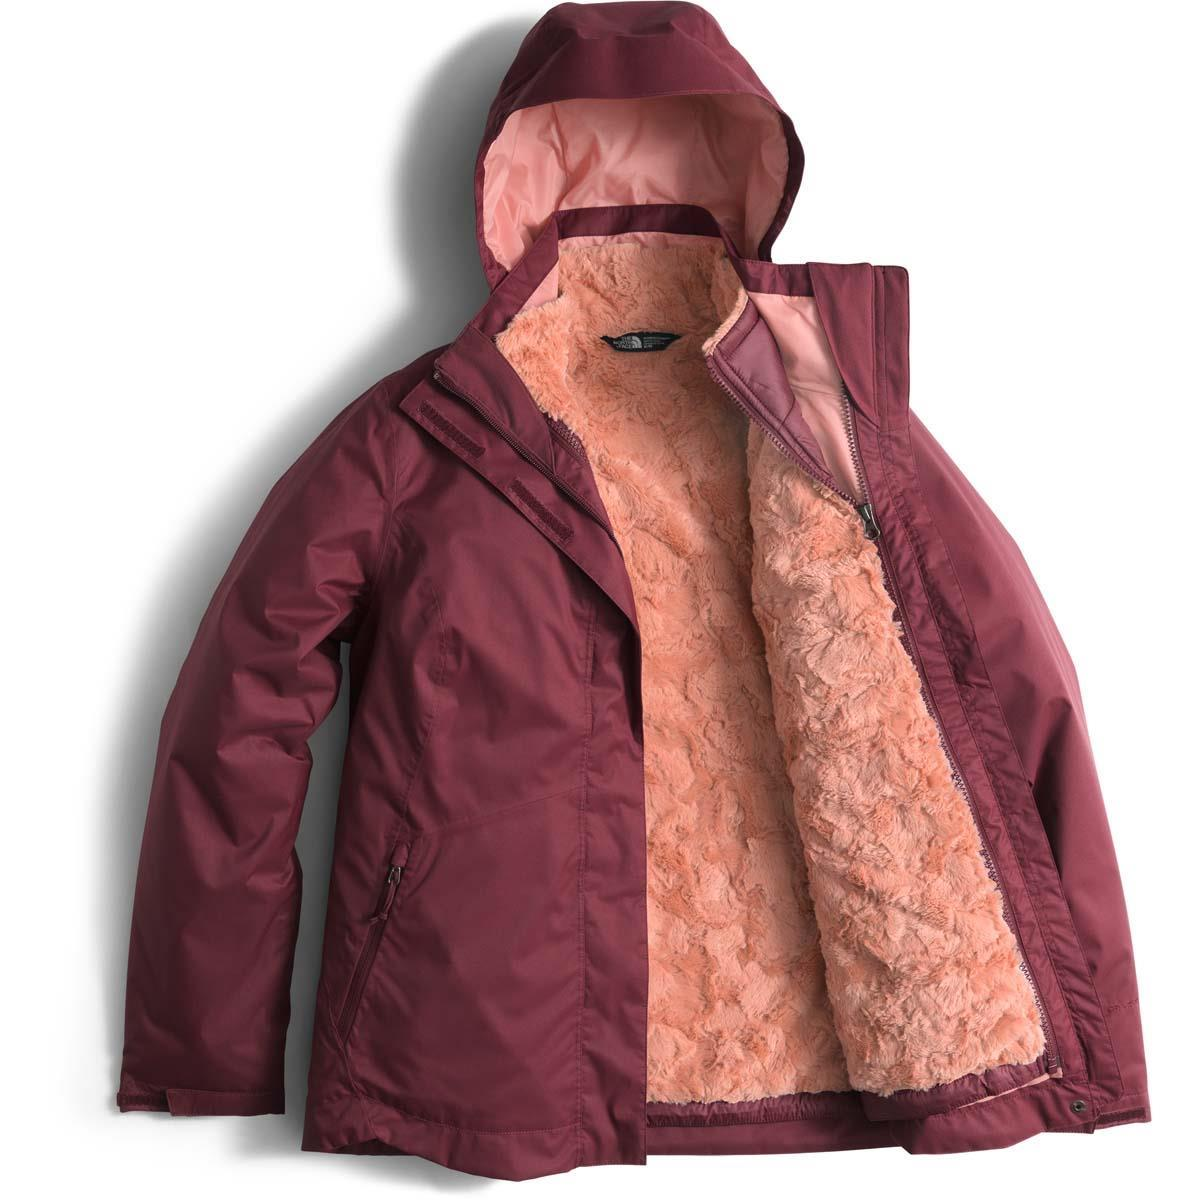 c027803da797 The North Face Mossbud Swirl Tri Jacket Womens. Loading zoom